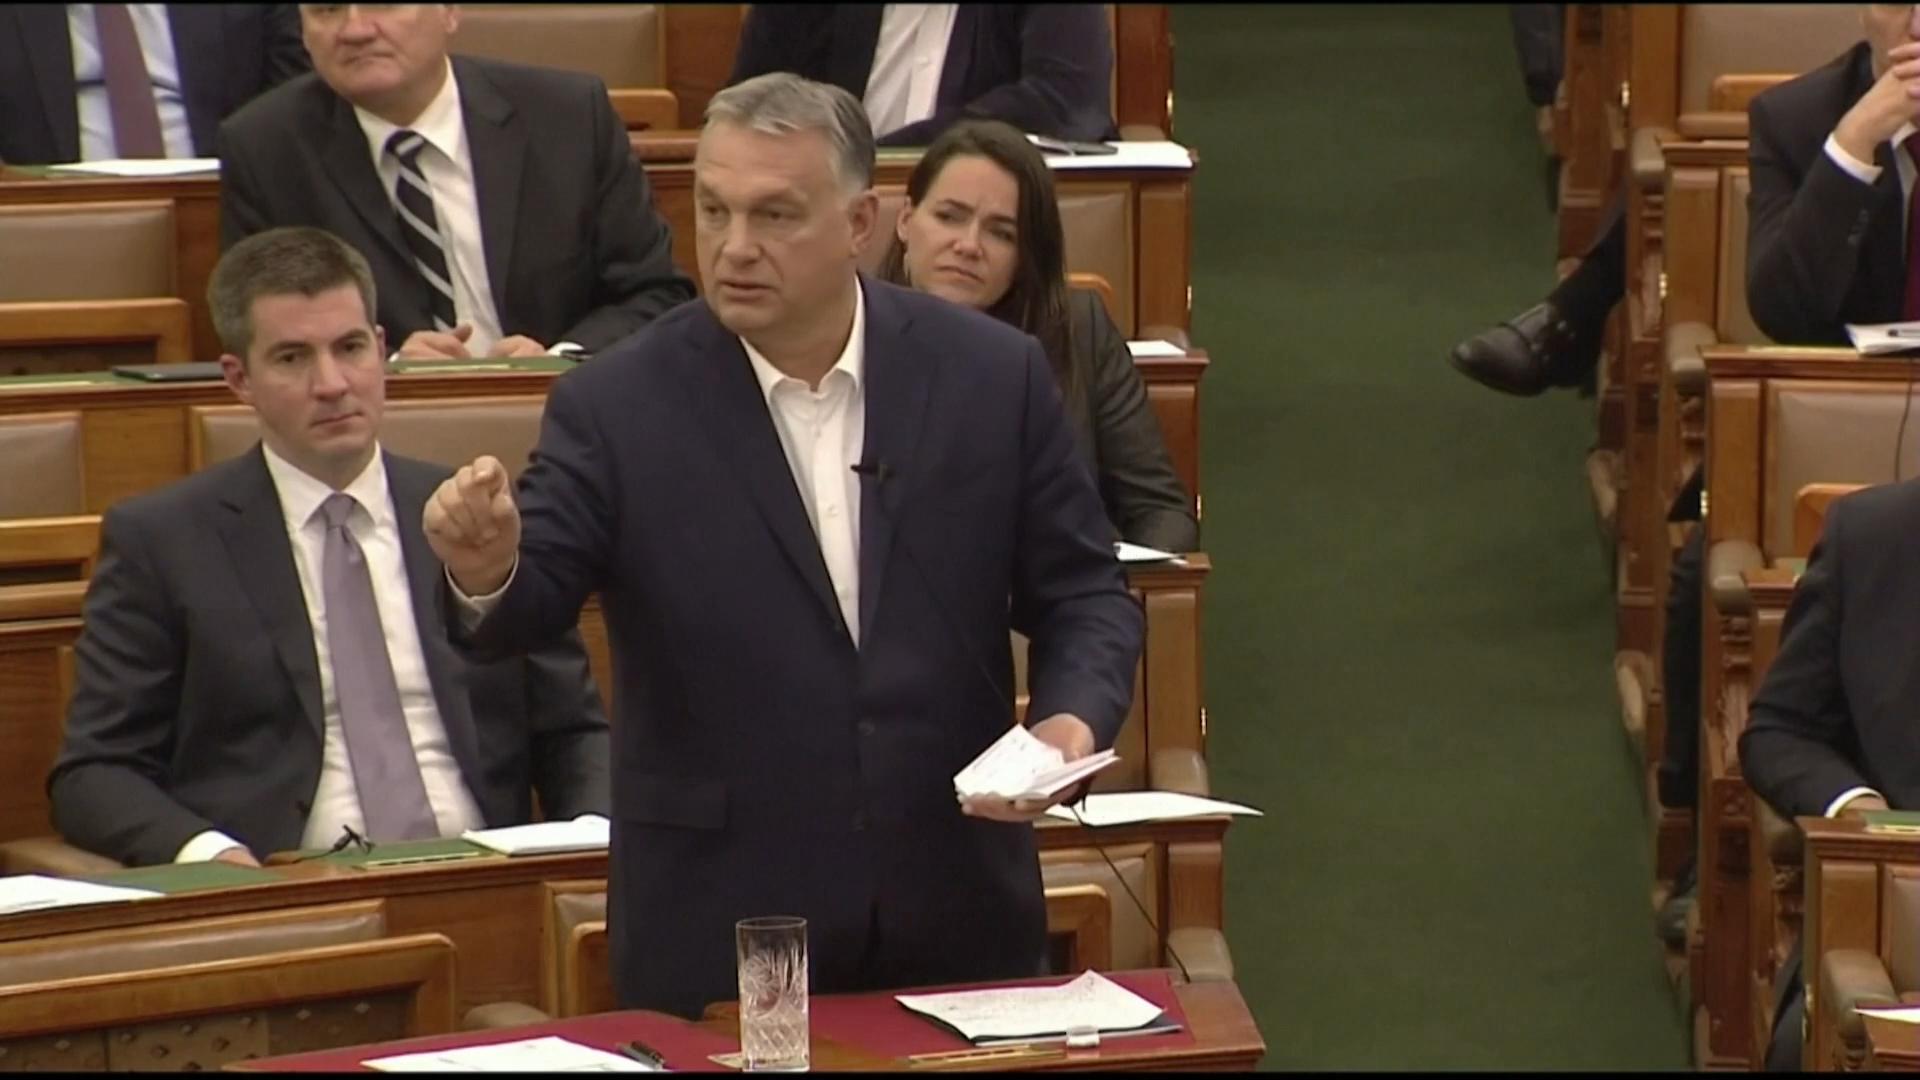 Hungary's Orban granted powers to rule by decree during coronavirus crisis